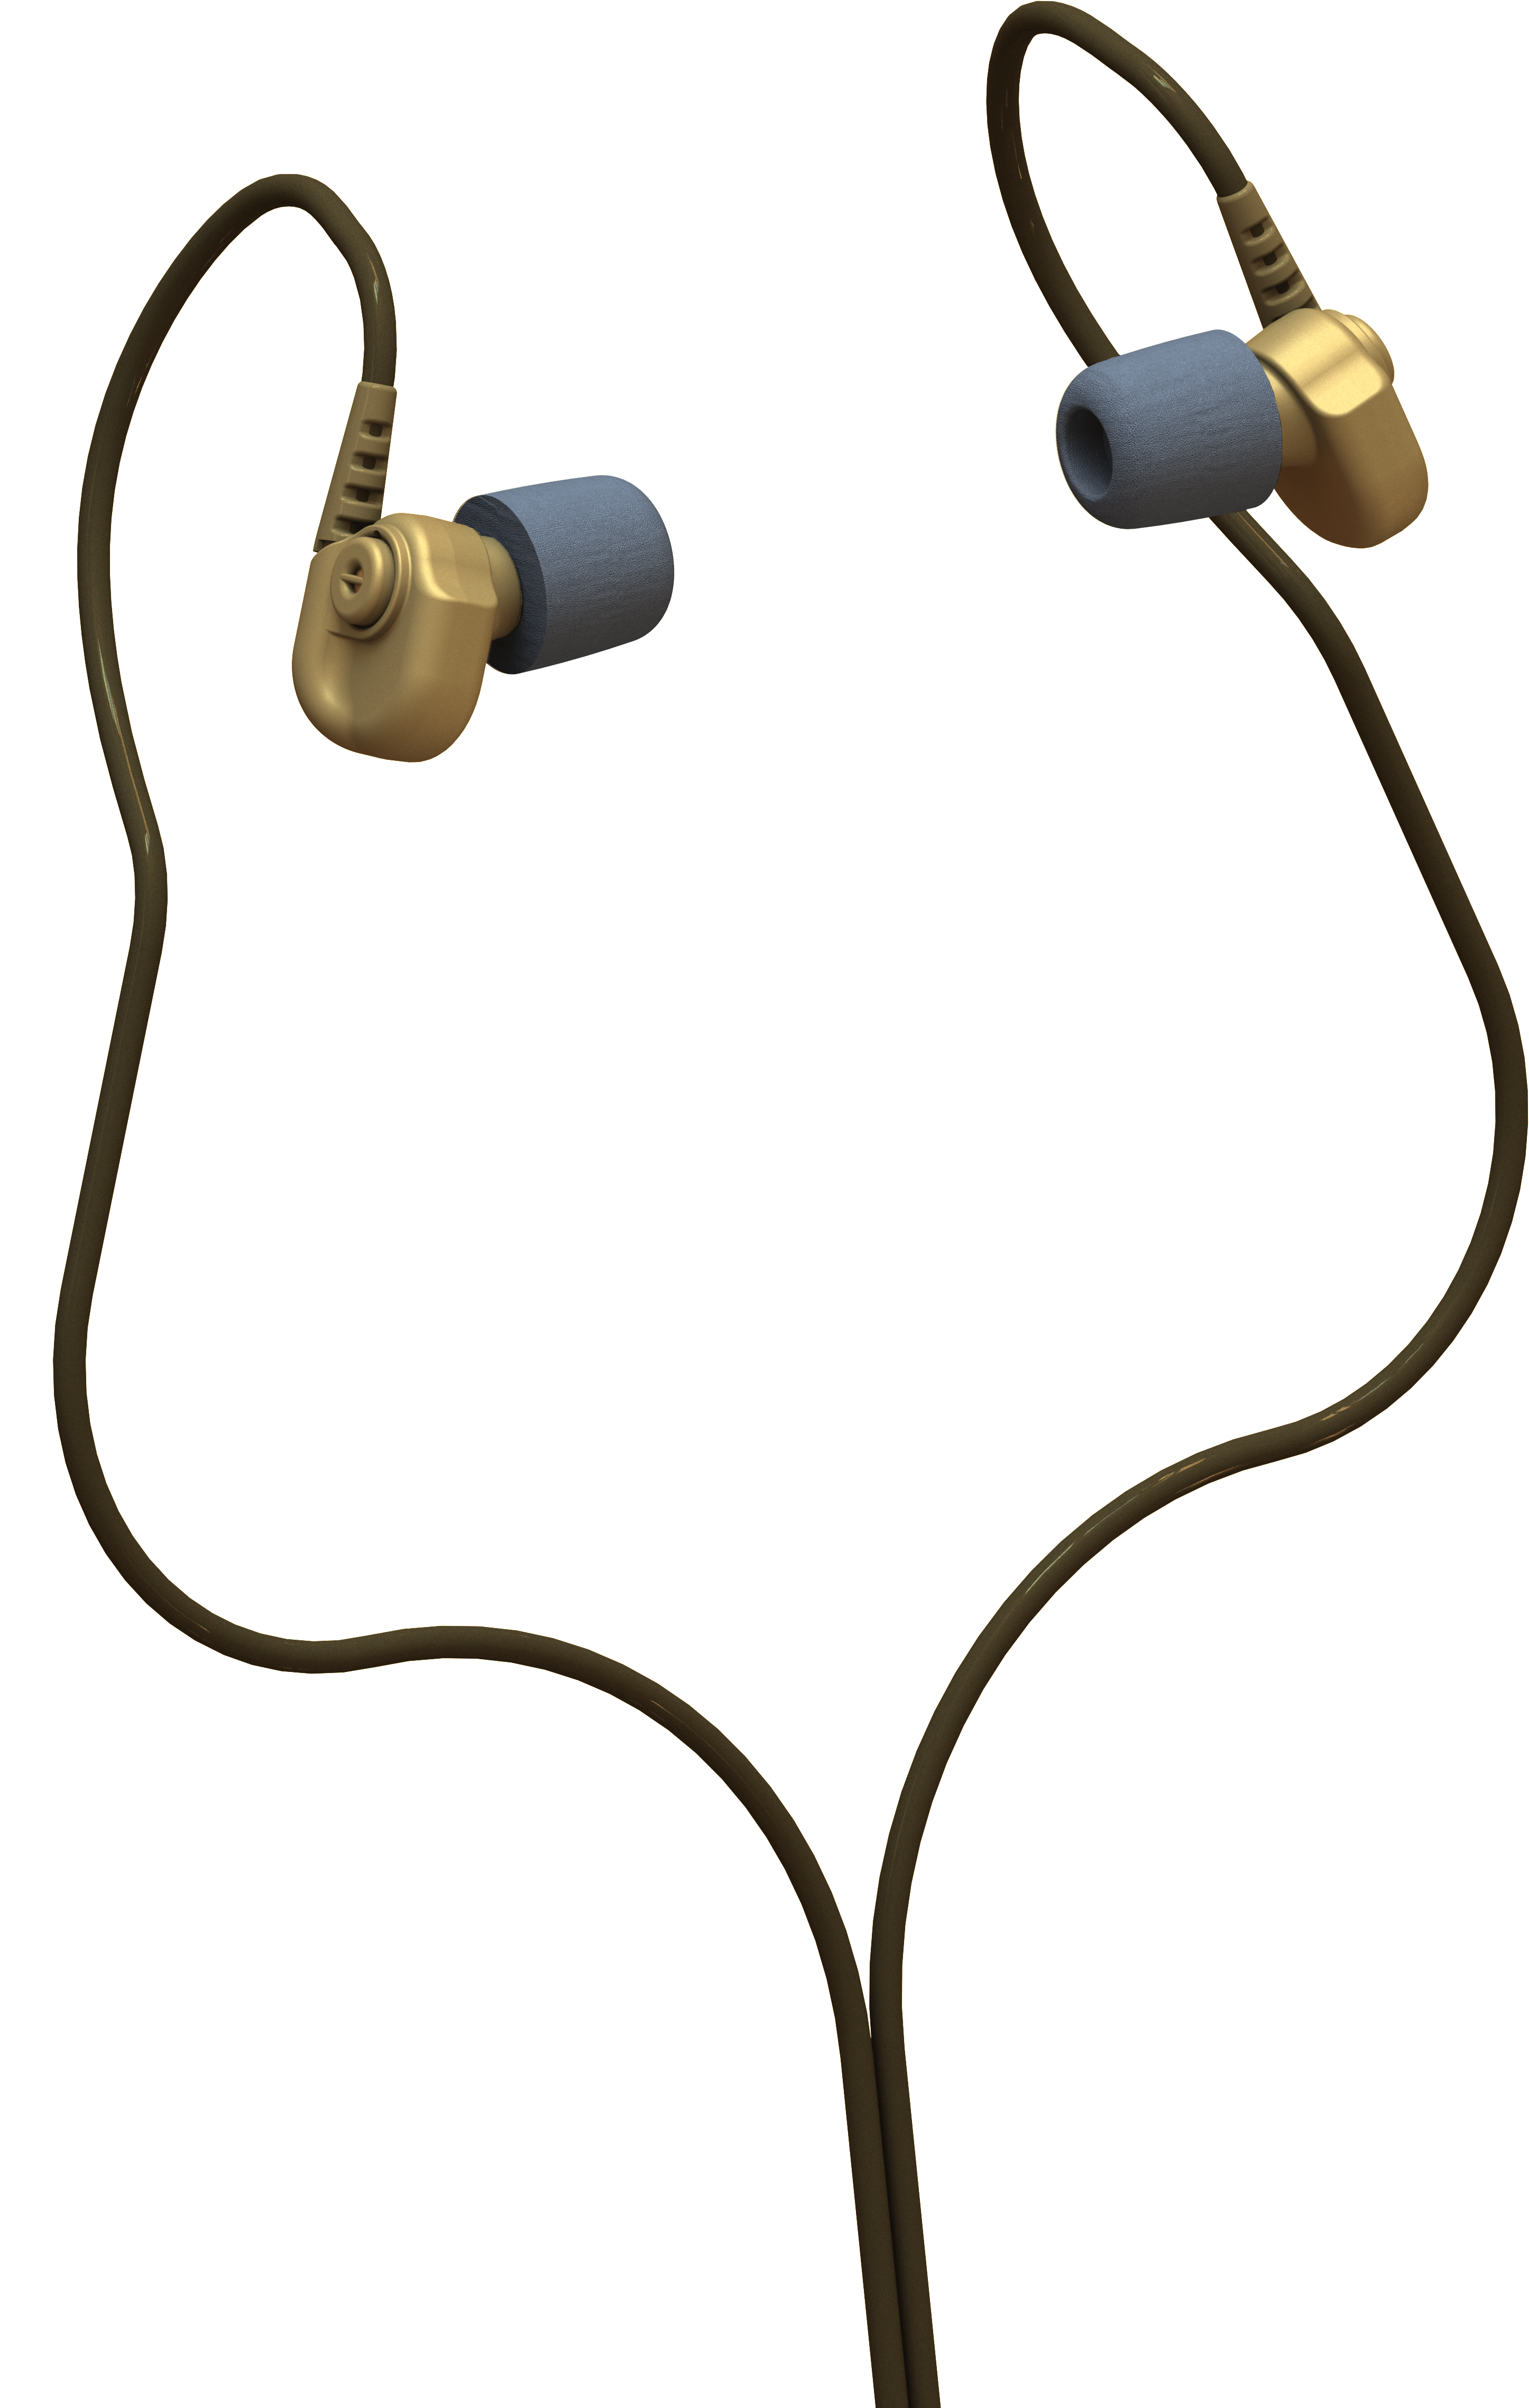 Headphone clipart radio headphone. Ares multi comm ptt